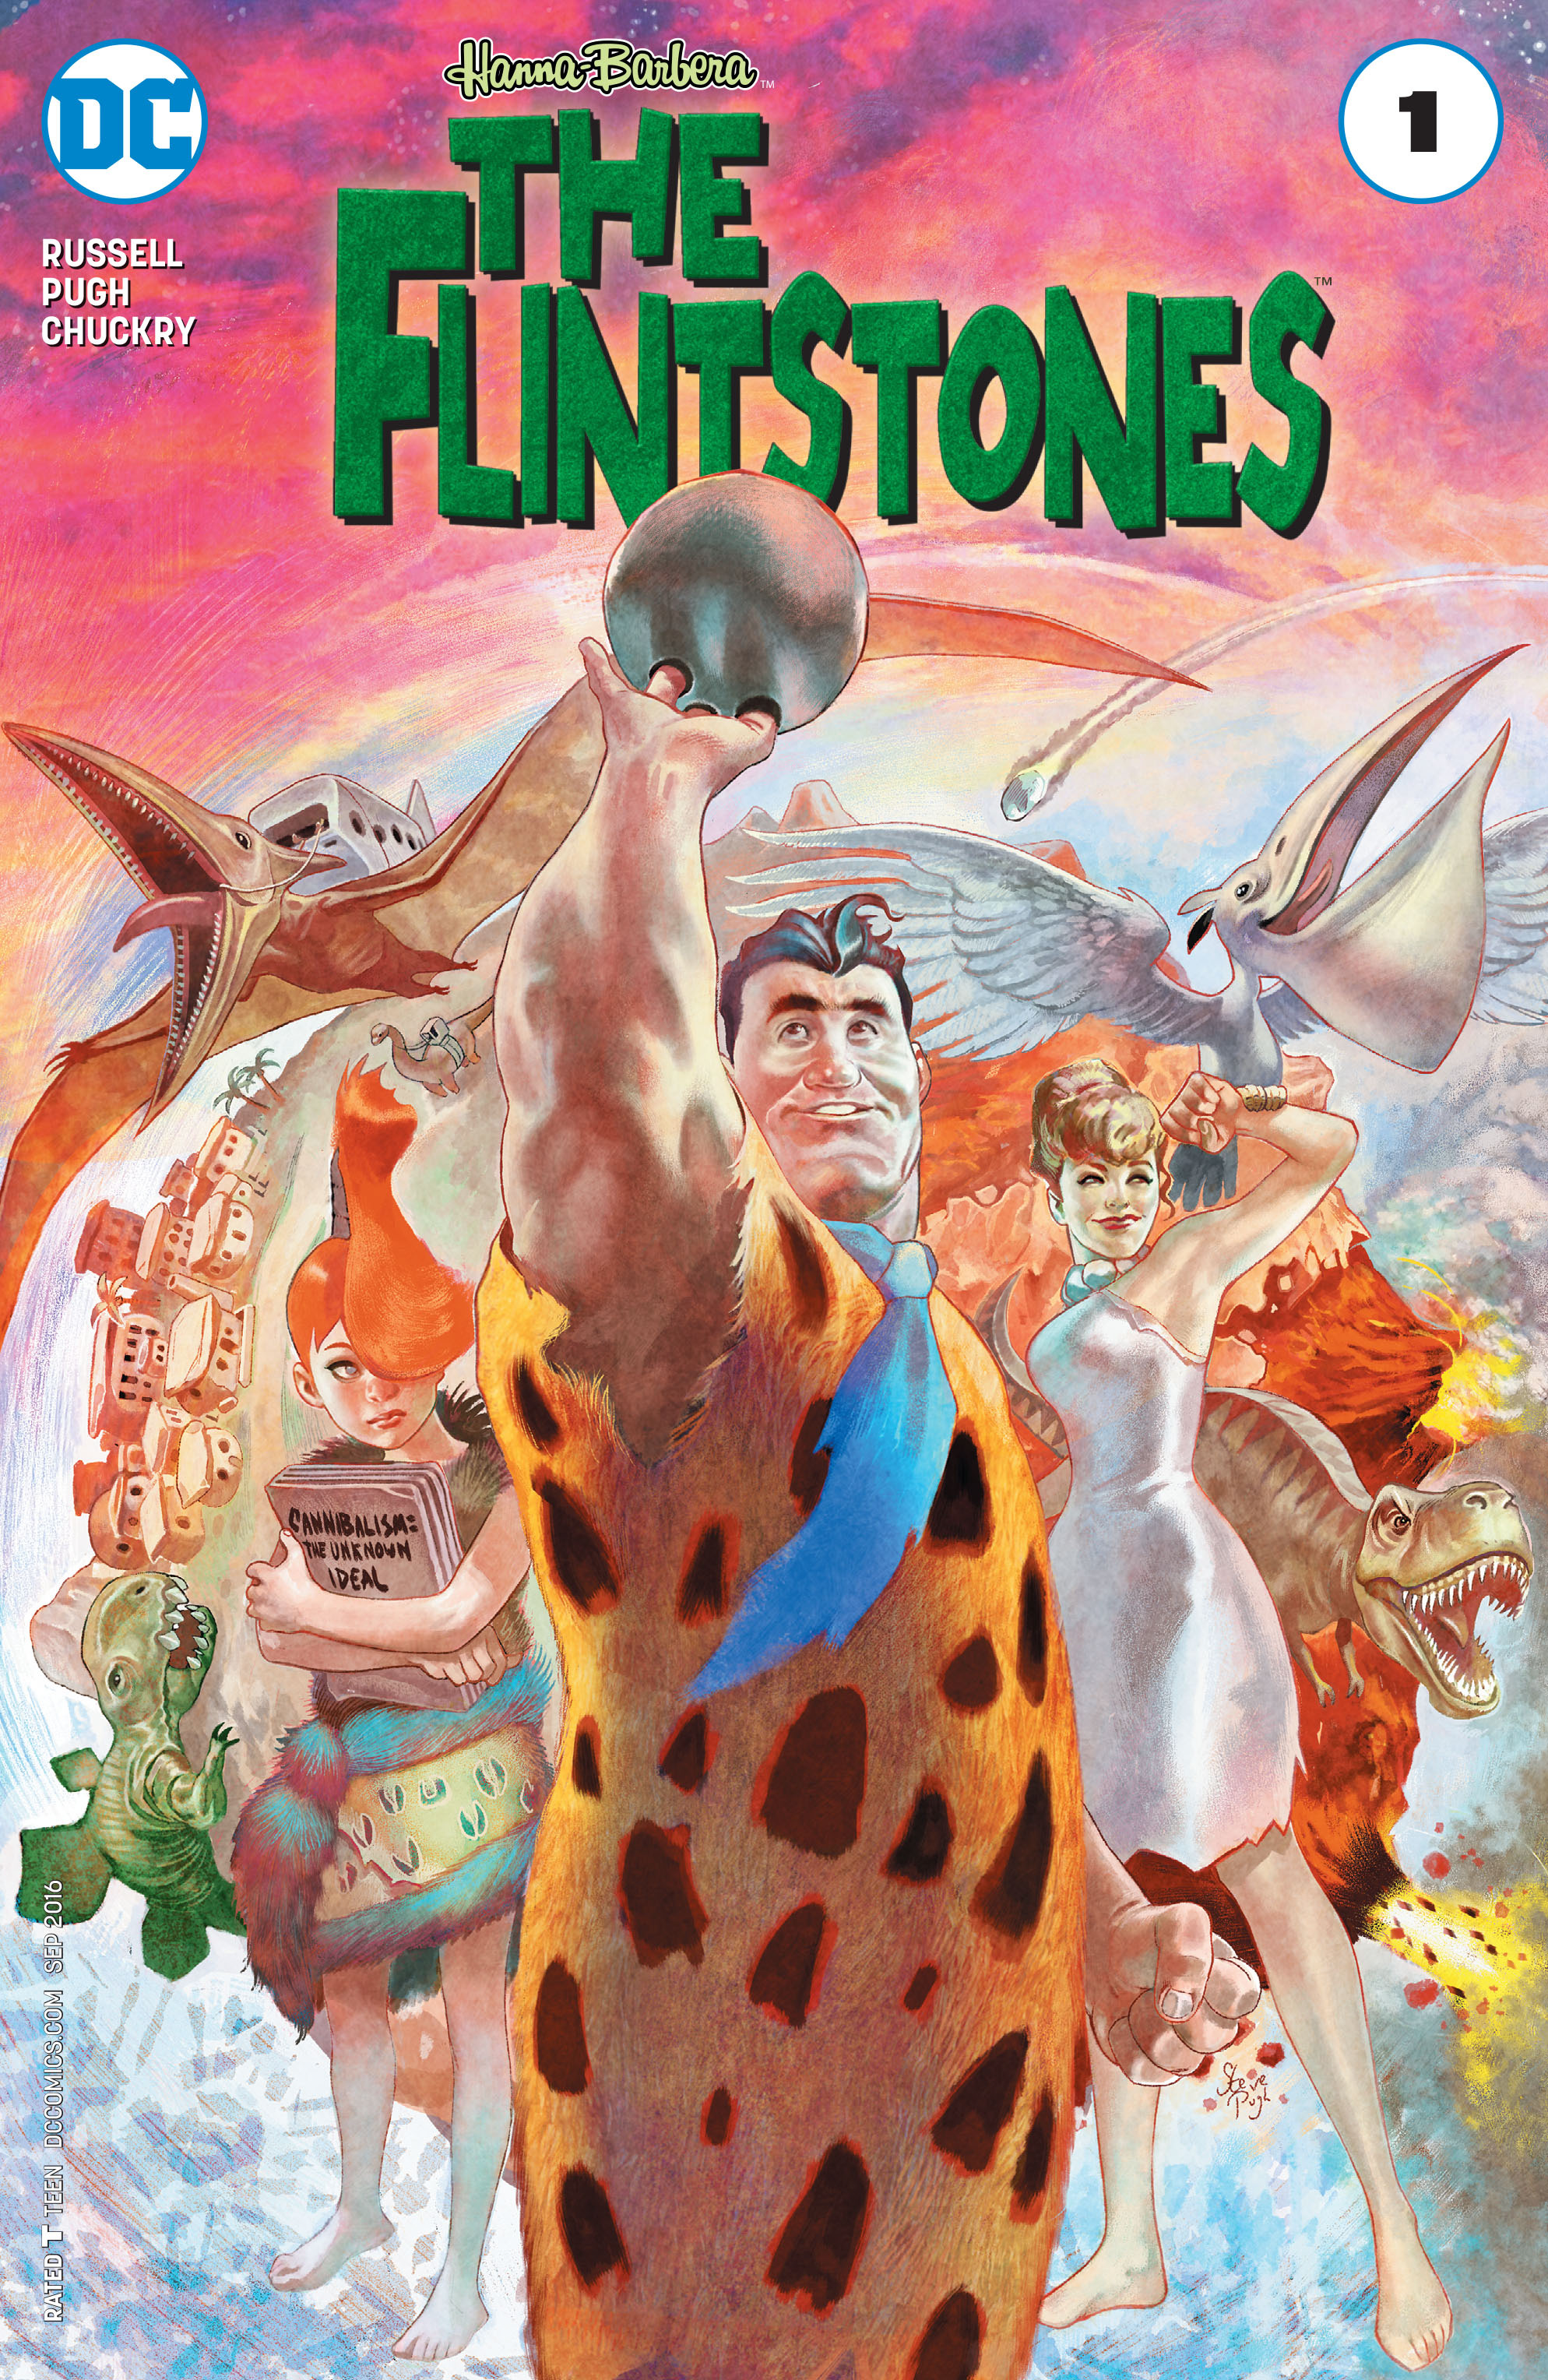 Global Earth Propaganda Used In Mass Media - Page 5 The-Flintstones-2016-001-000